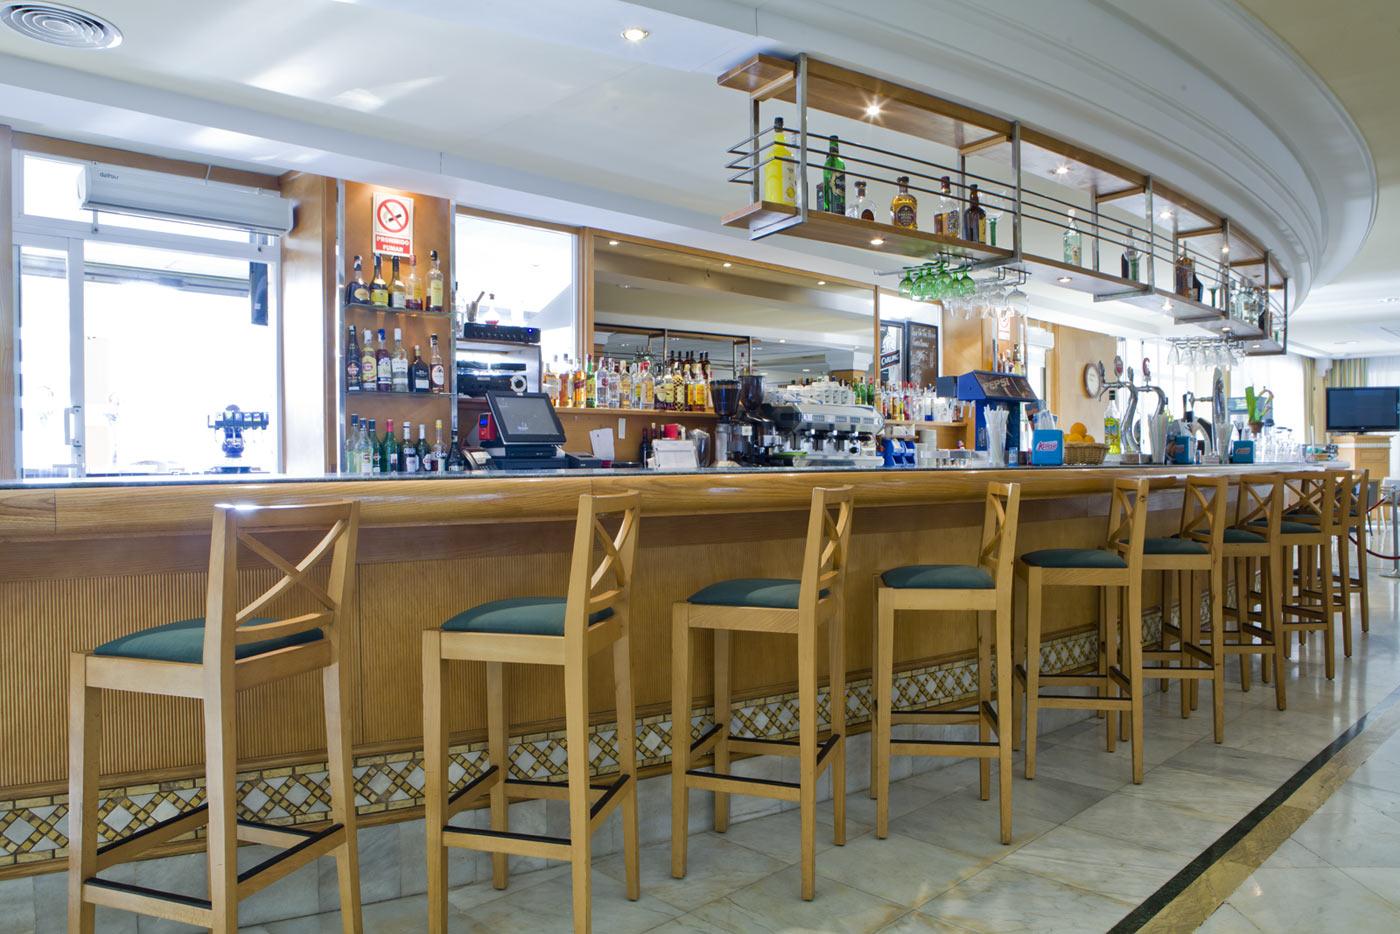 Galera de fotos Oficial del Hotel Samos en Magaluf Mallorca